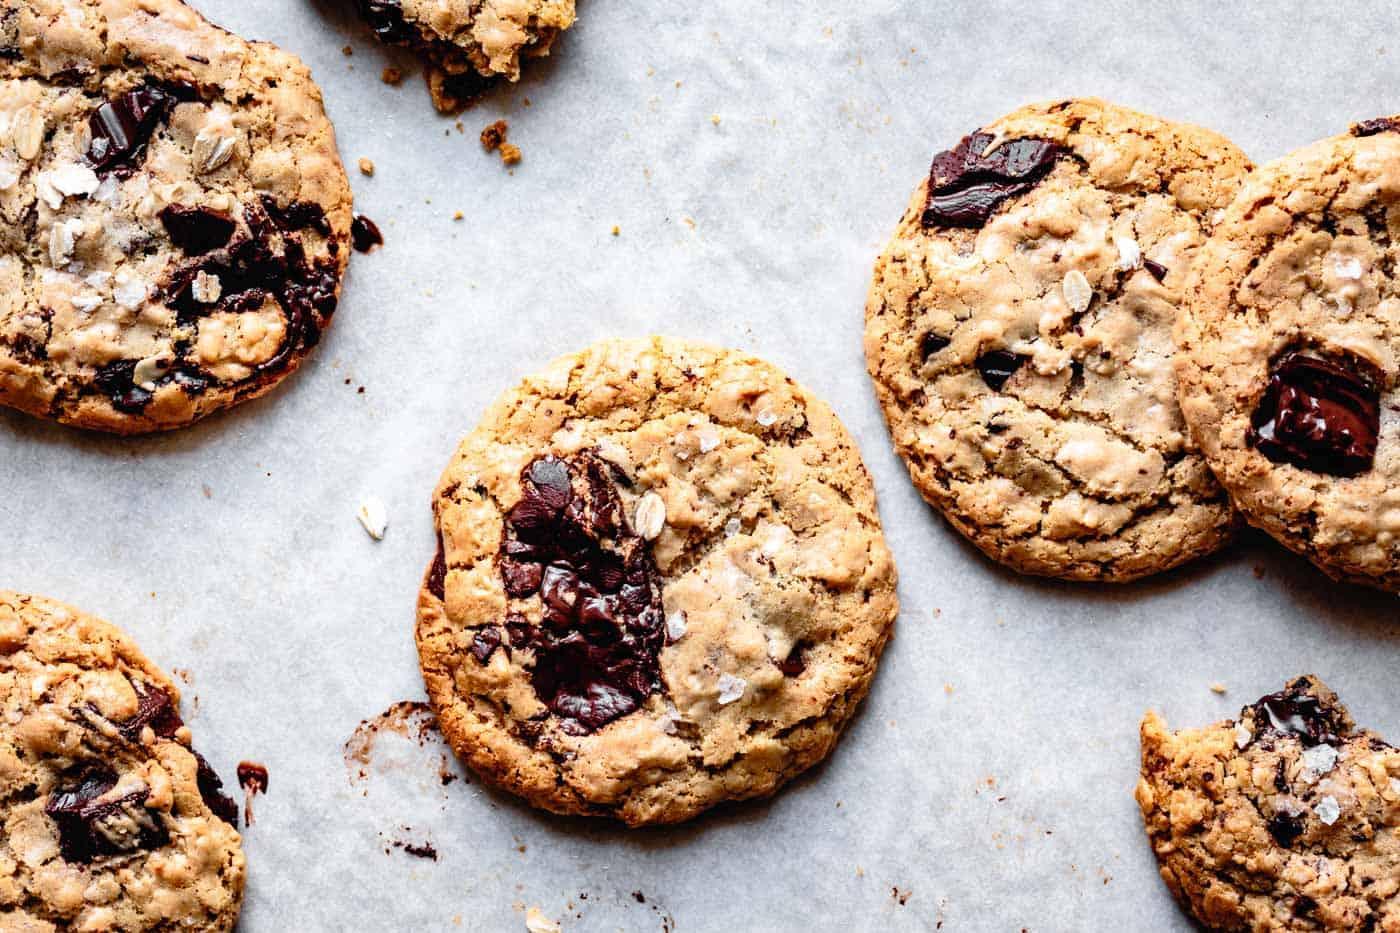 vegan chocolate chip cookies on a baking sheet